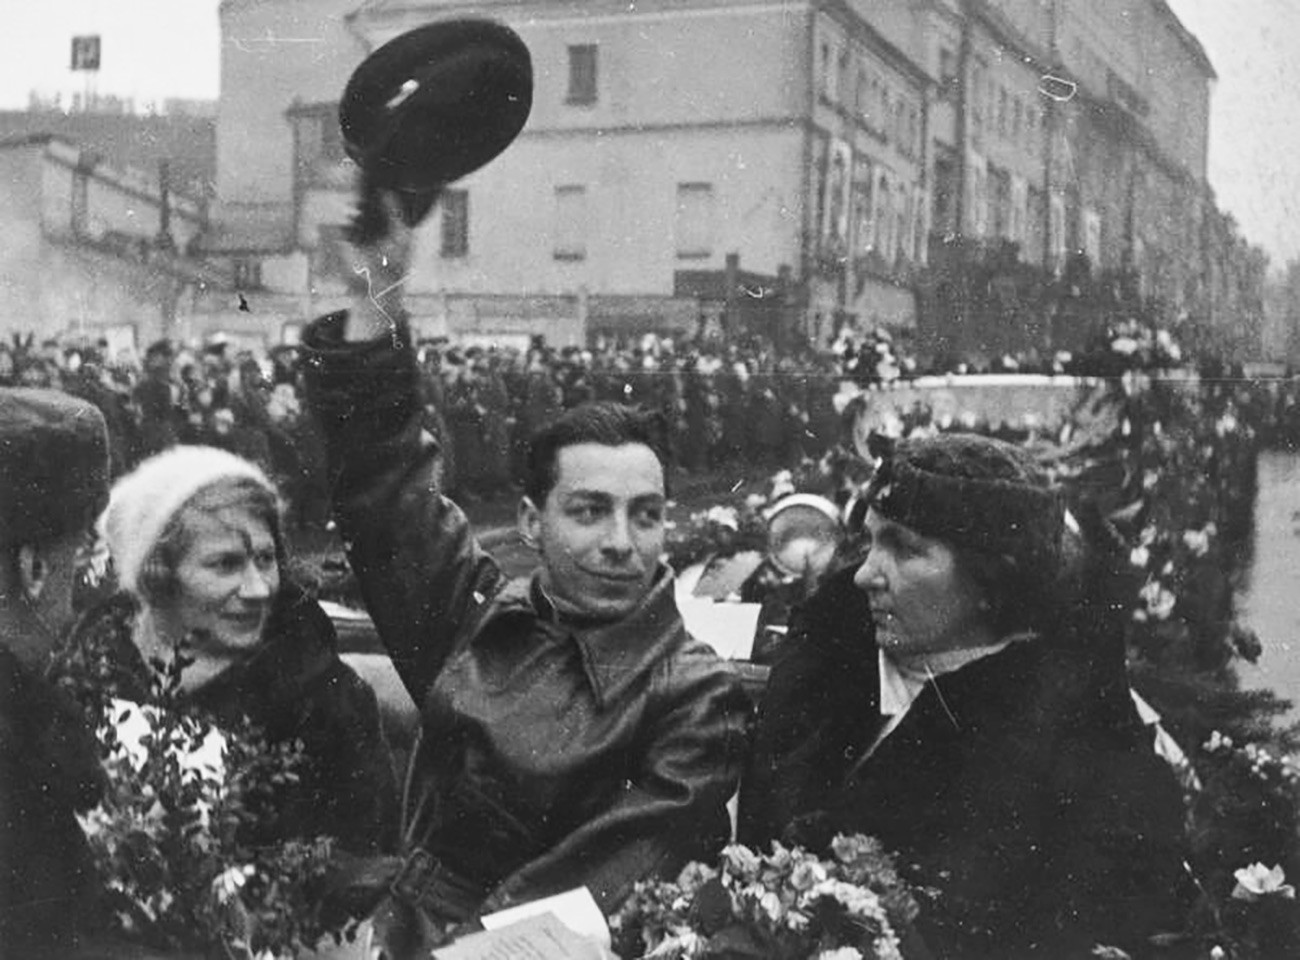 Accueil des héros à Moscou. Ici, Evgueni Fiodorov